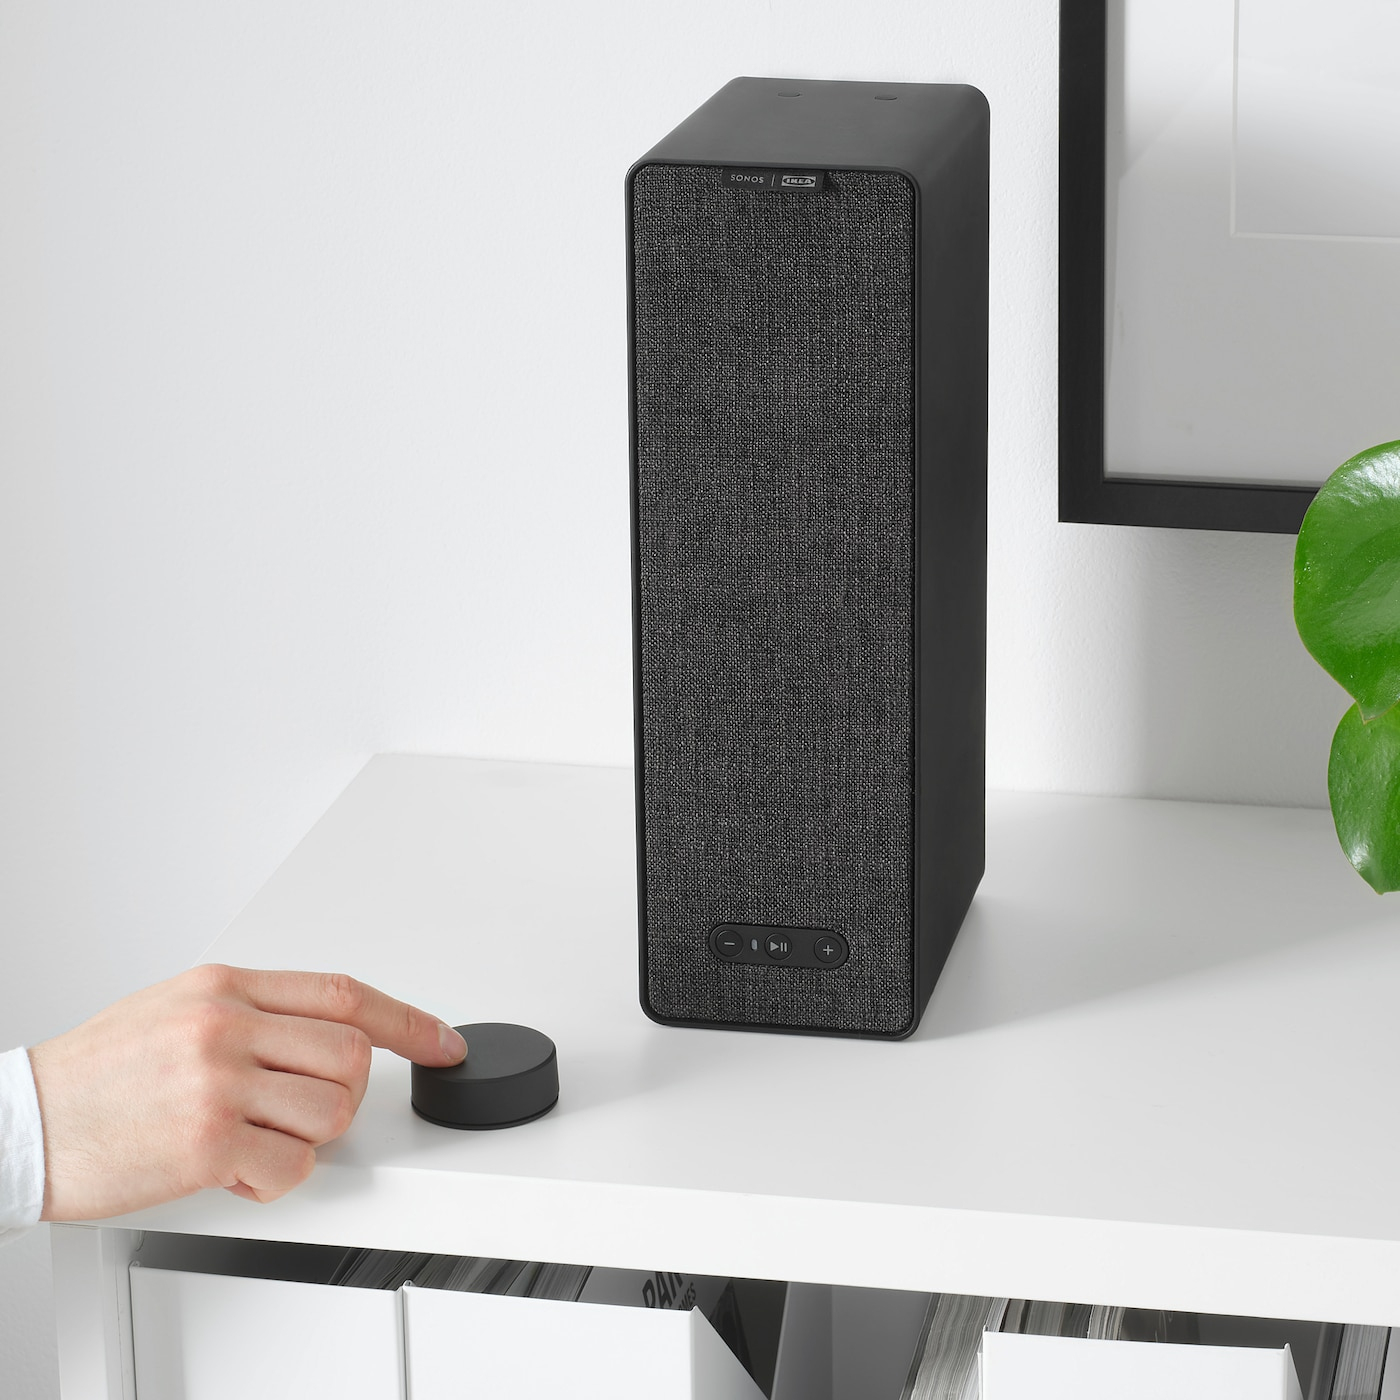 Symfonisk Télécommande Volume - Noir dedans Table Jardin Ikea Occasion